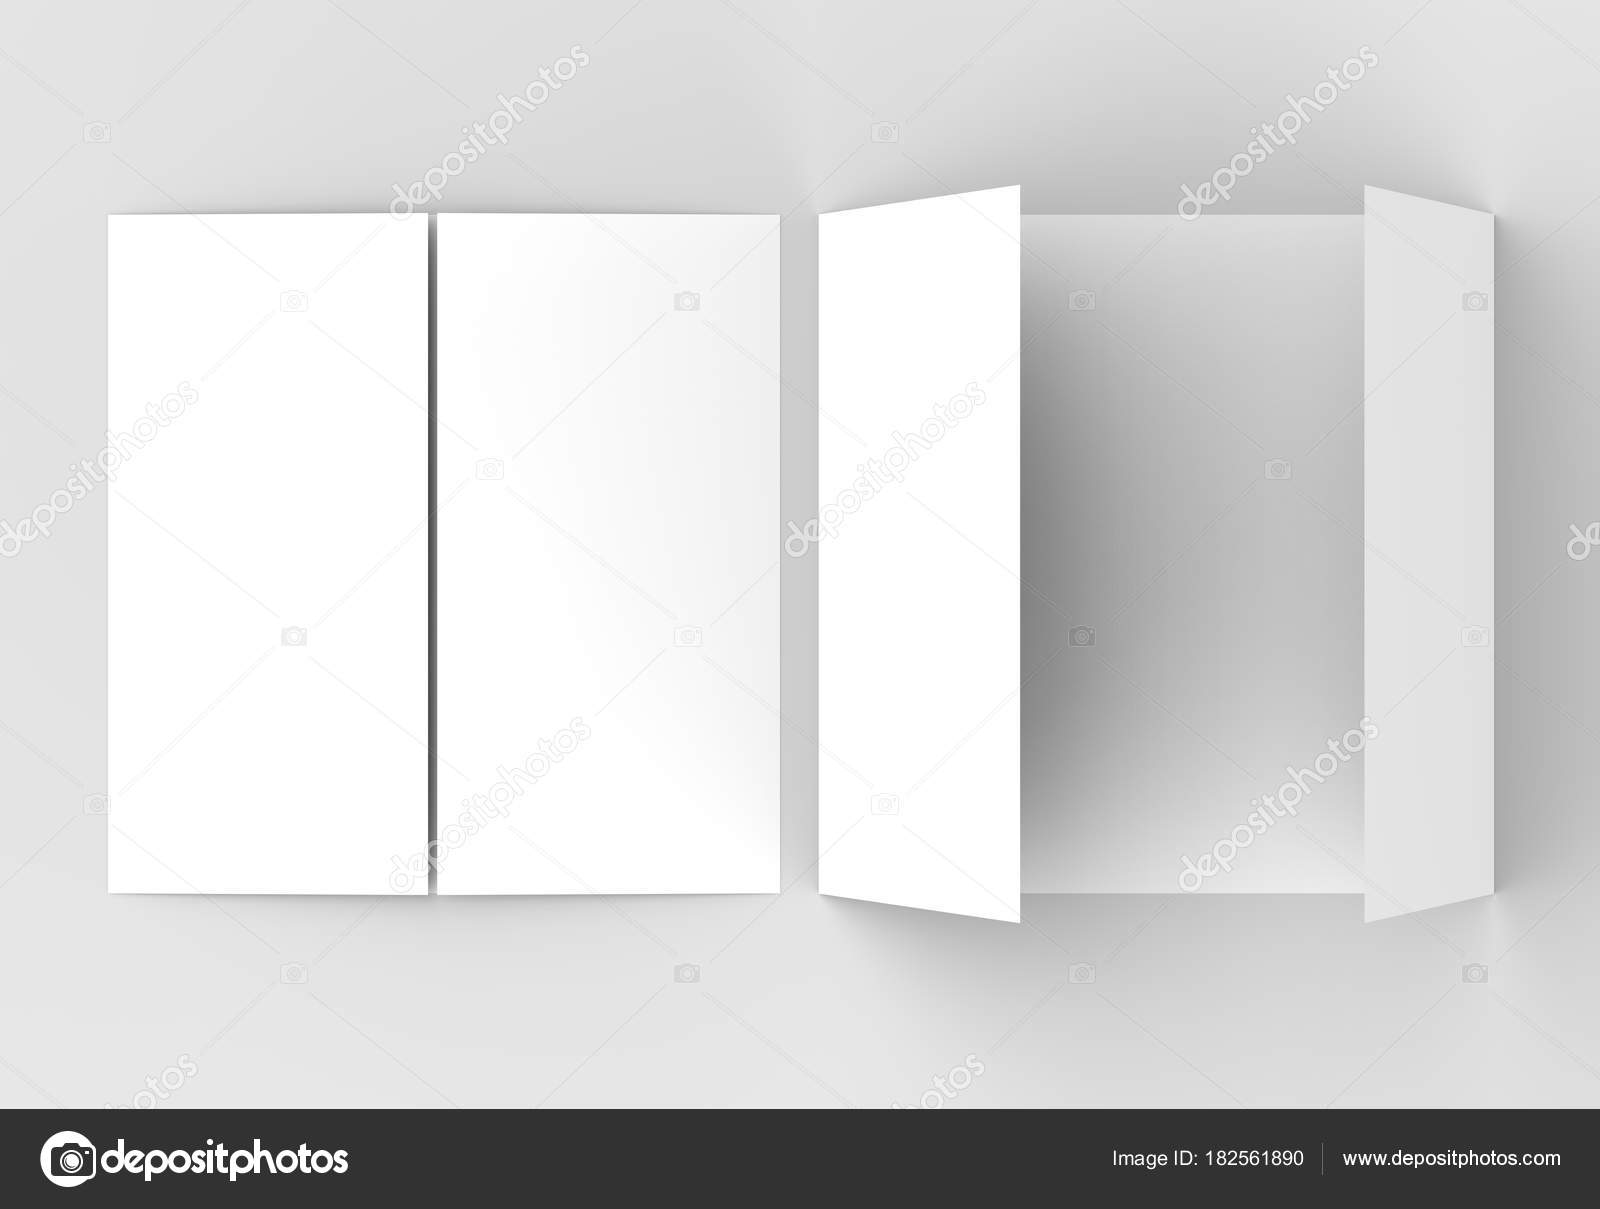 Gate fold brochure mockup | Square gate fold brochure mock